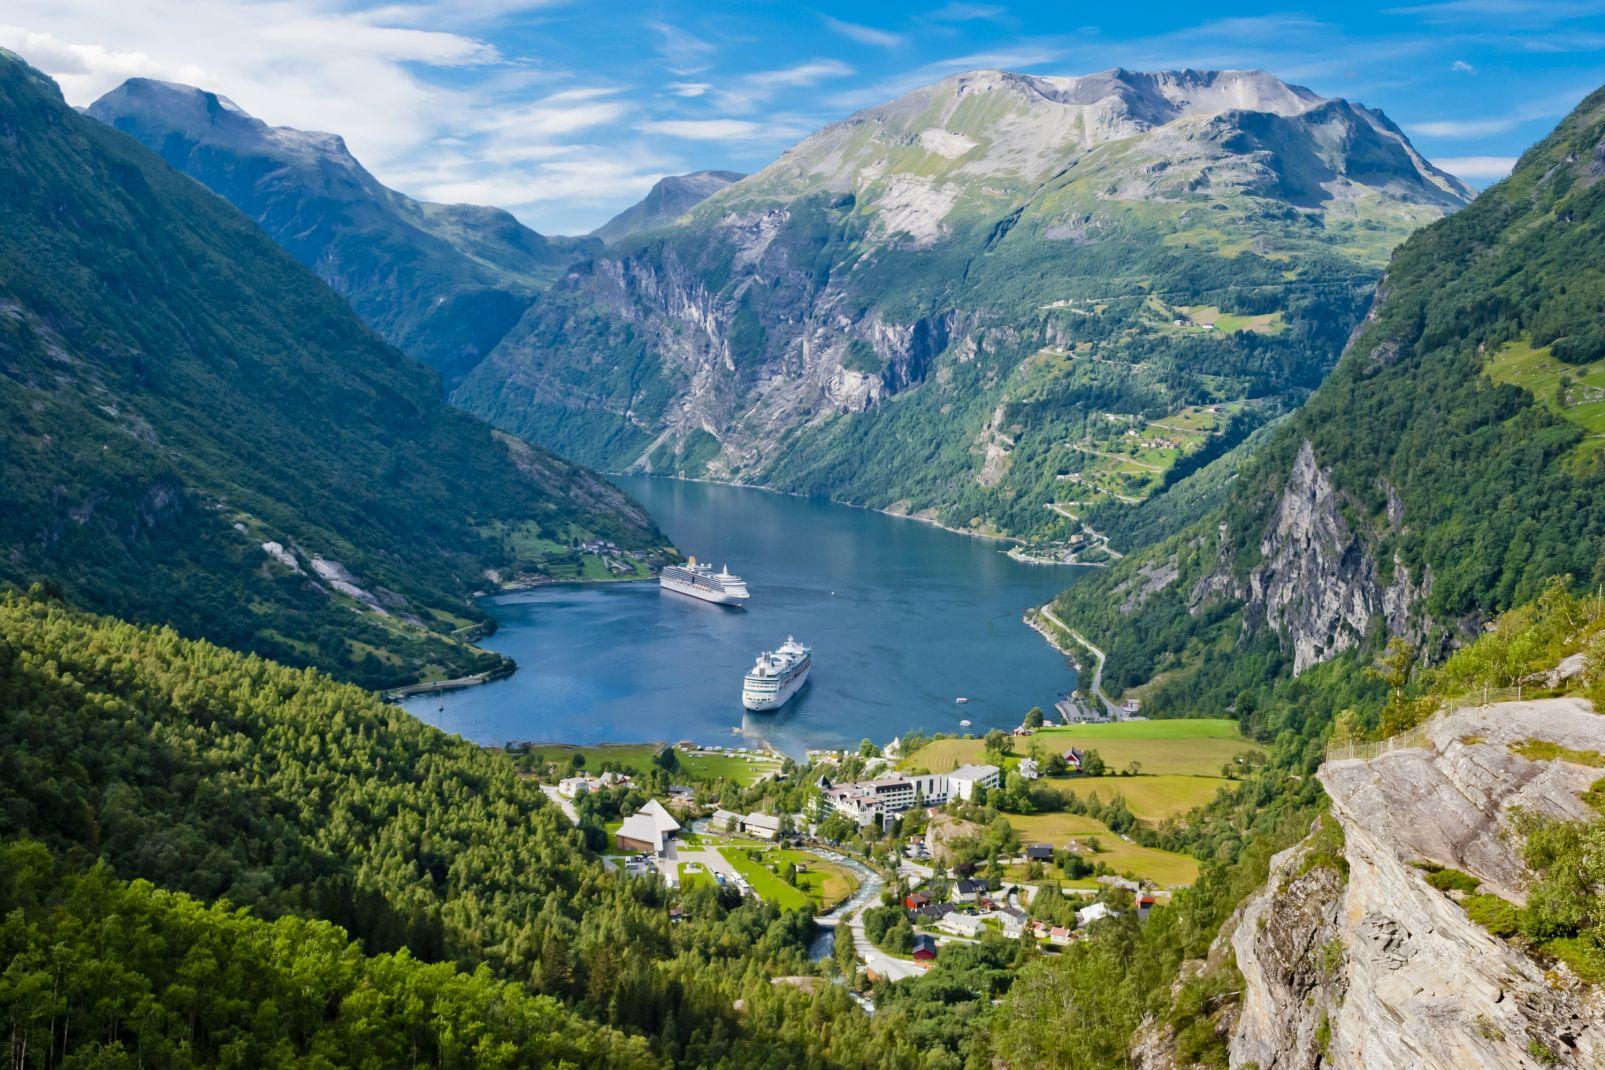 norvège, europe, scandinavie, croisière, fjord, Geiranger